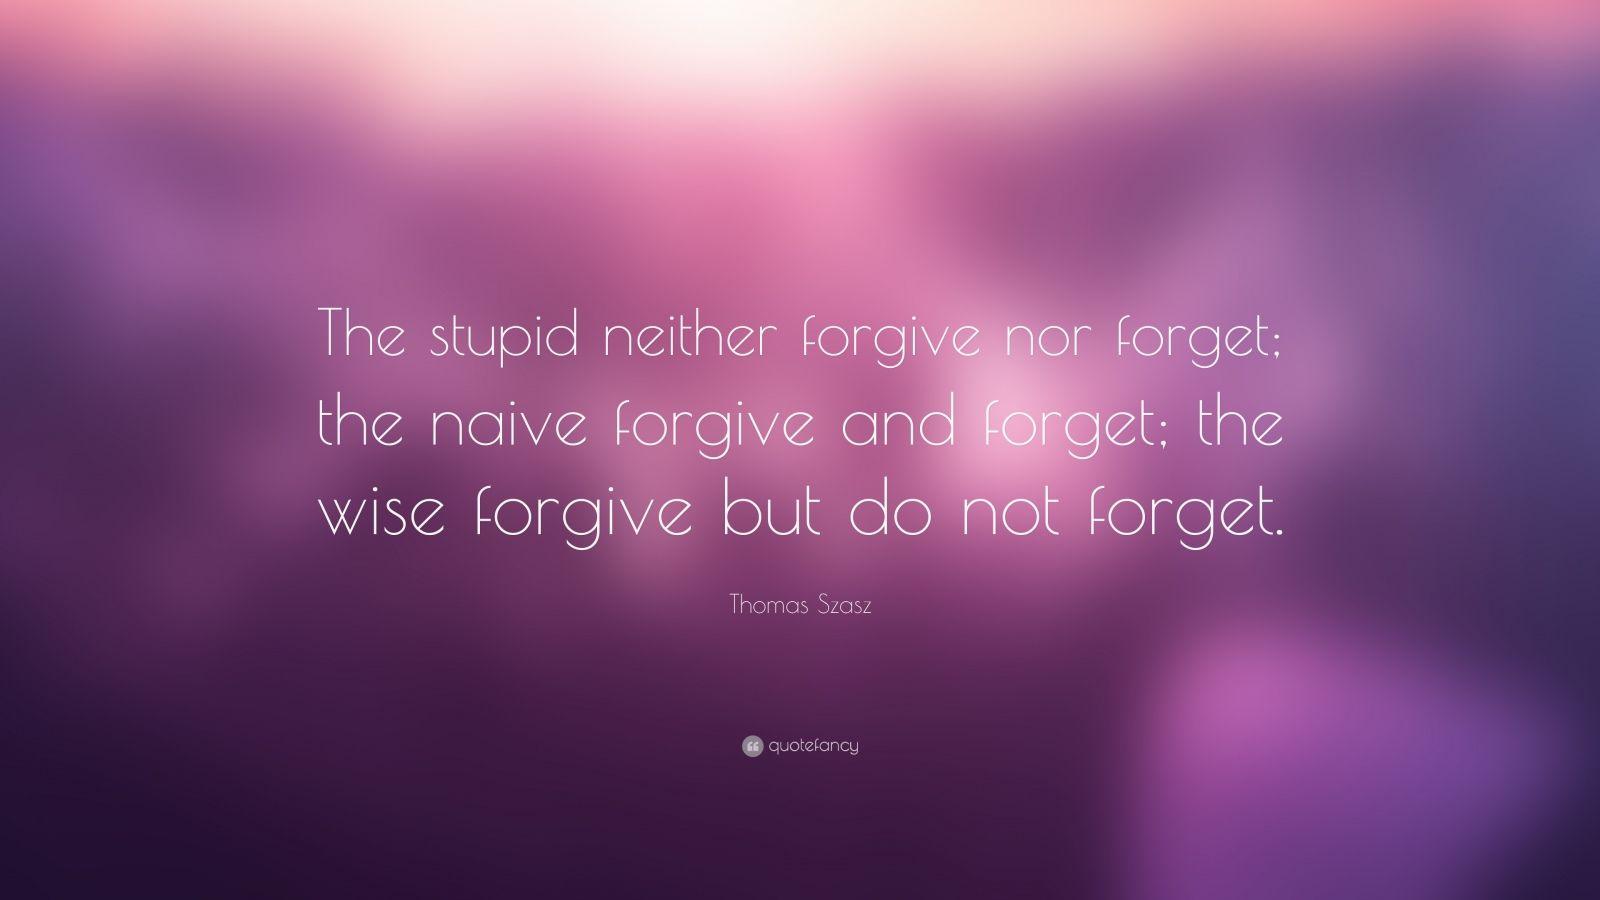 narrative essays on forgiveness